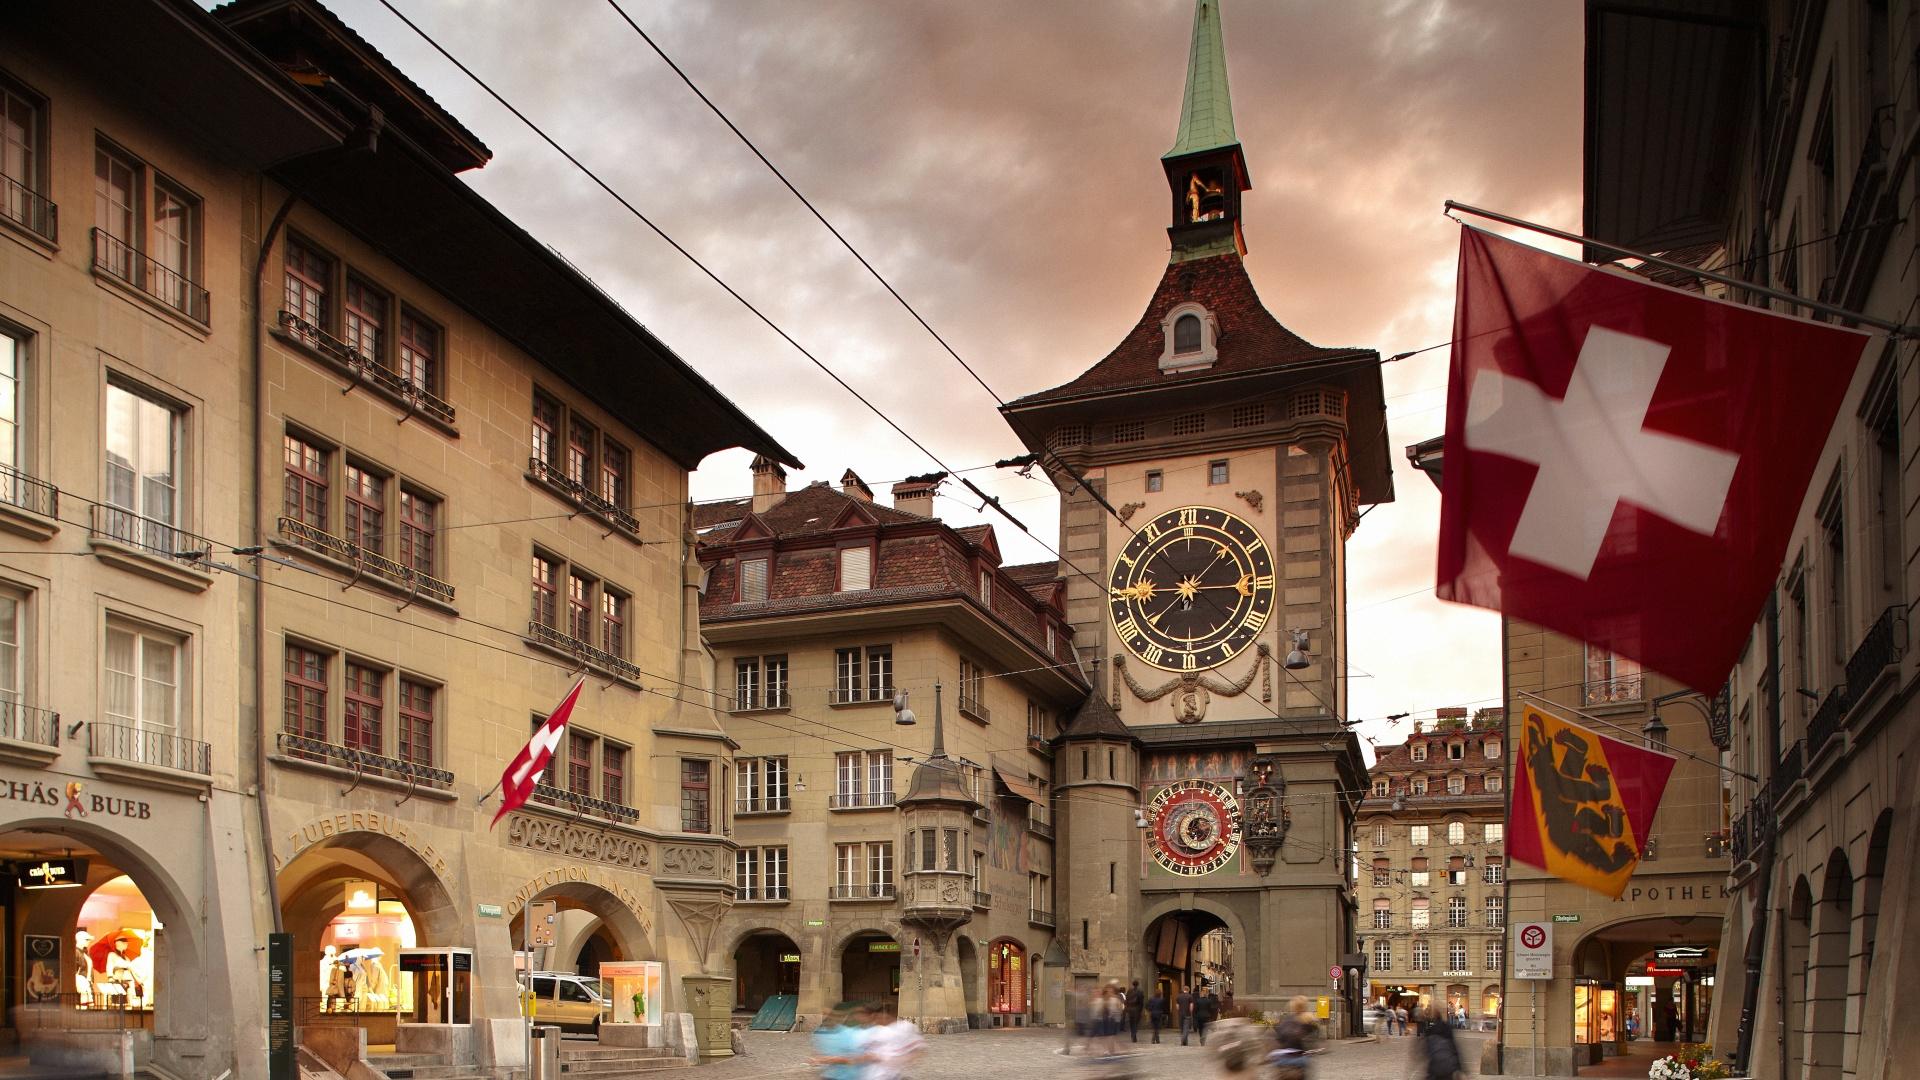 Berns Clock Tower Iconic Landmark Zytglogge - Bern Switzerland Attractions